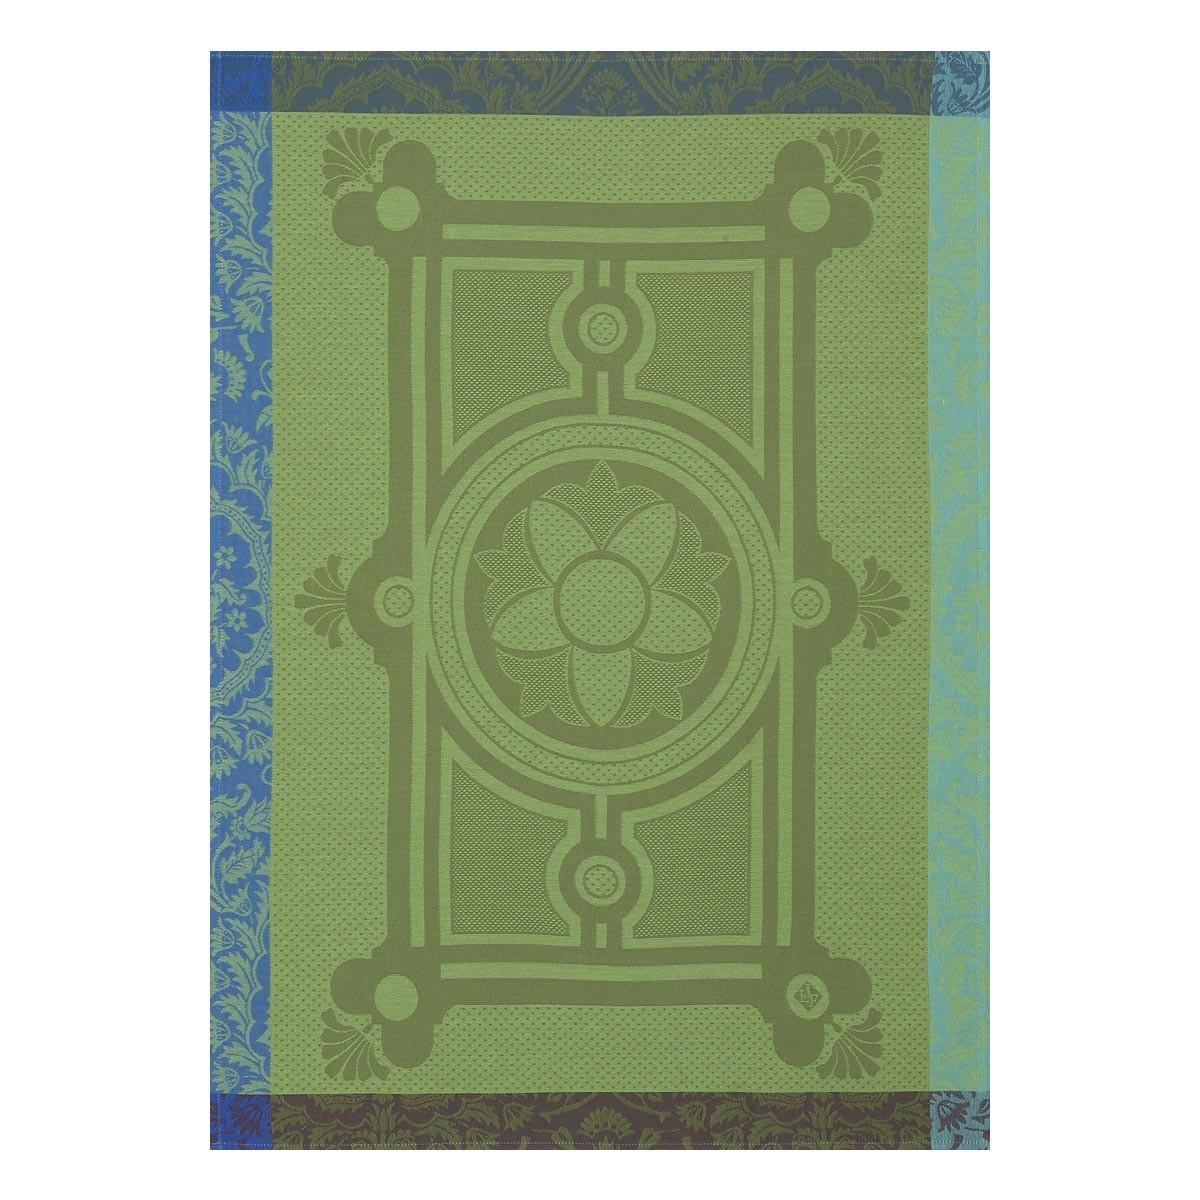 LJF Jardin Francais Gazon Green Tea Towel